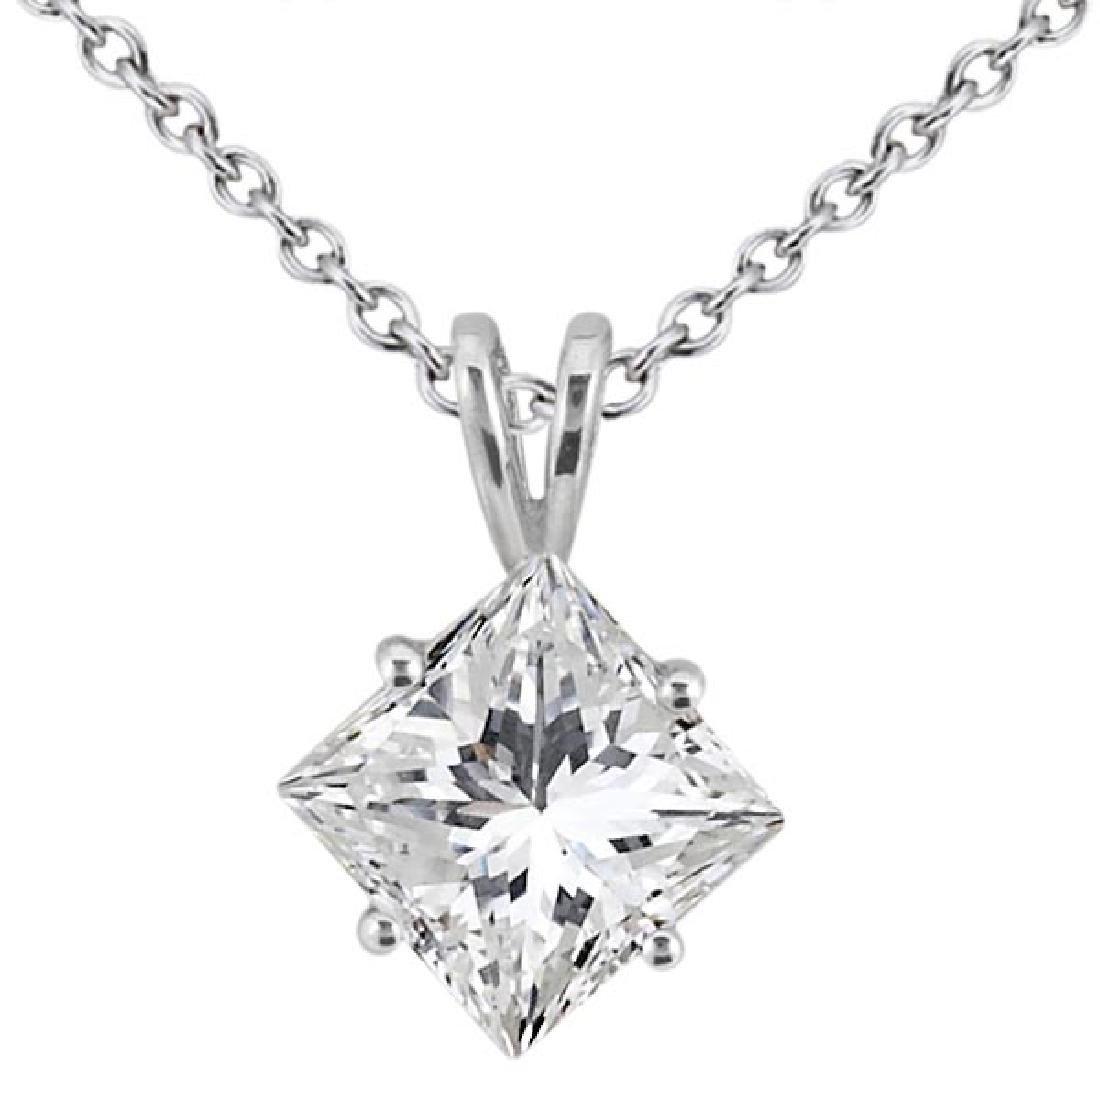 1.00ct. Princess-Cut Diamond Solitaire Pendant in 18k W